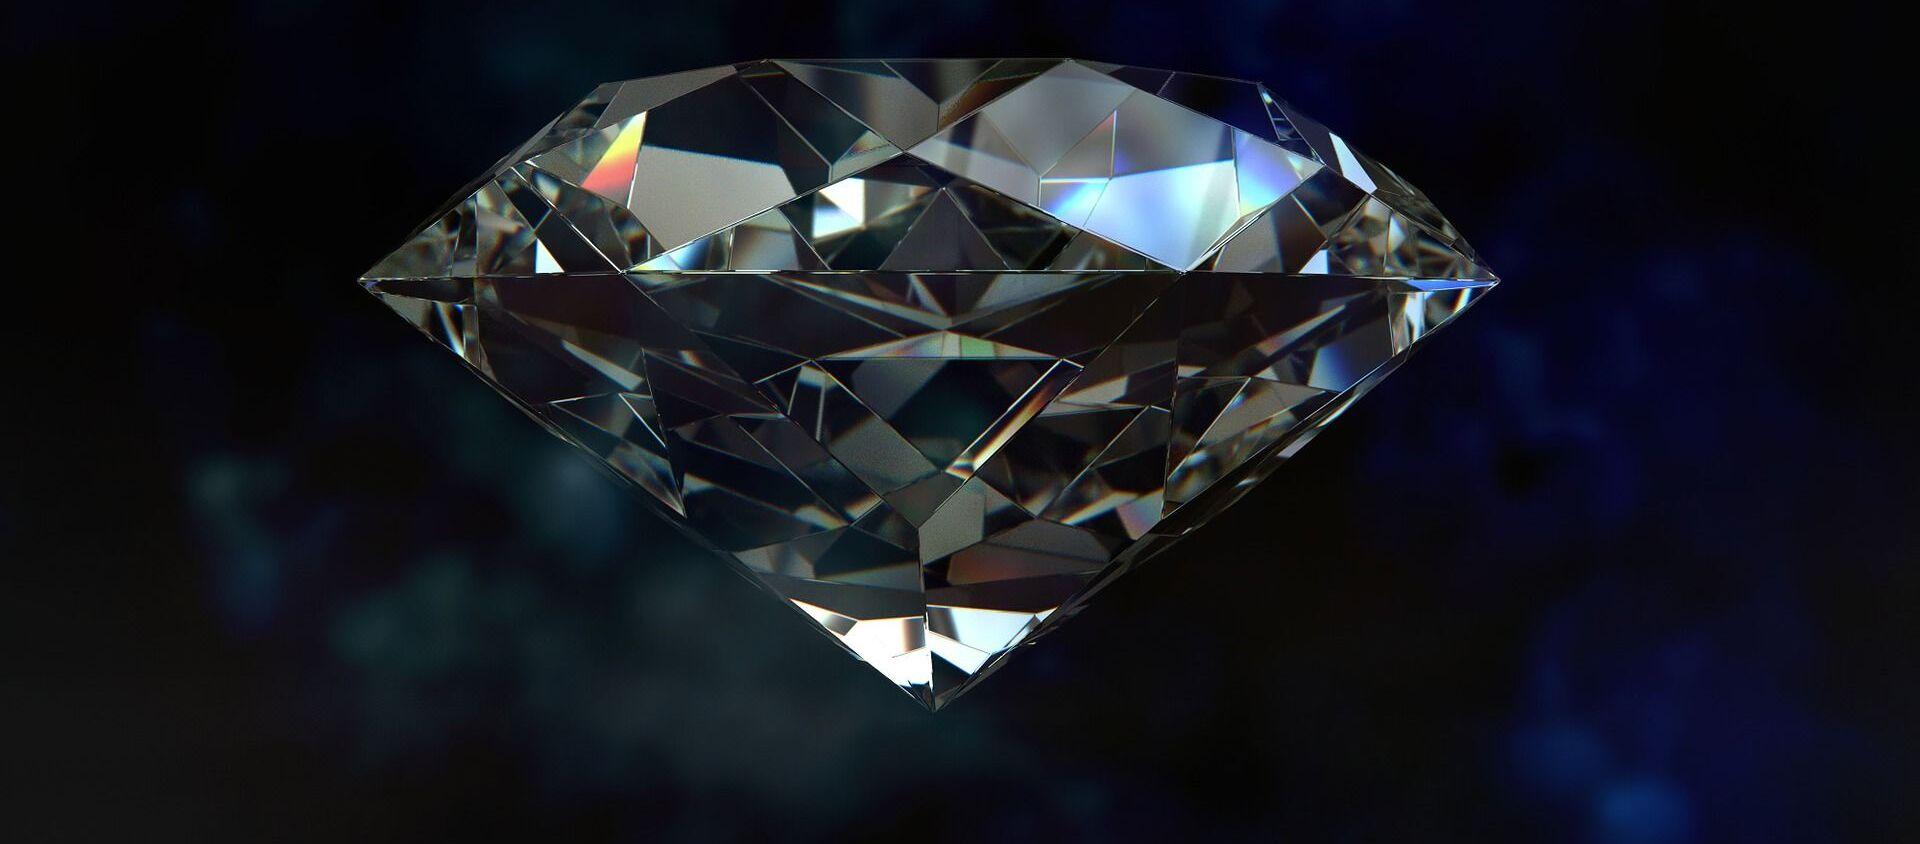 Un diamante - Sputnik Mundo, 1920, 02.10.2020